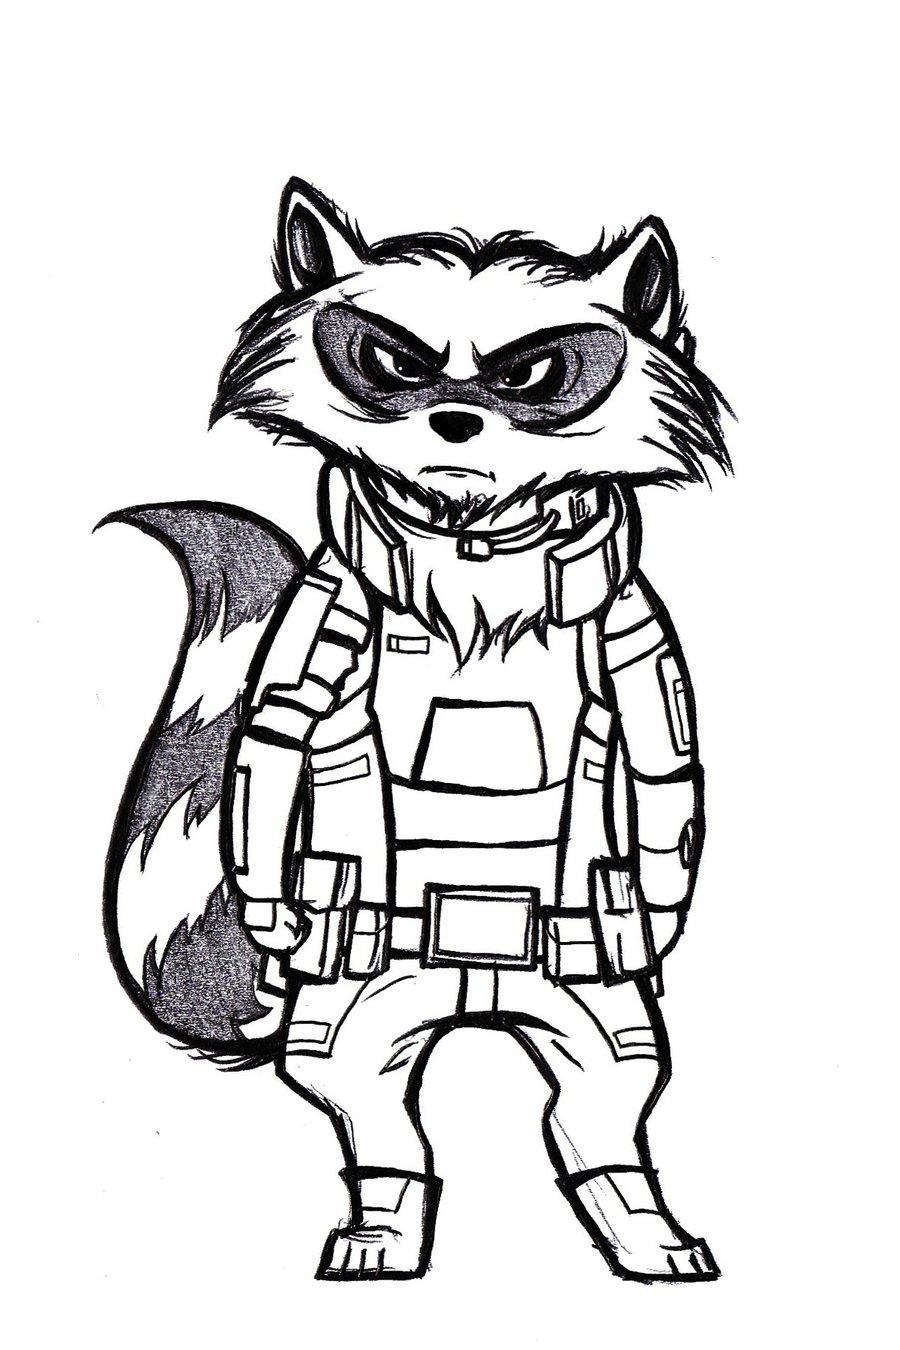 Simple Rocket Drawing